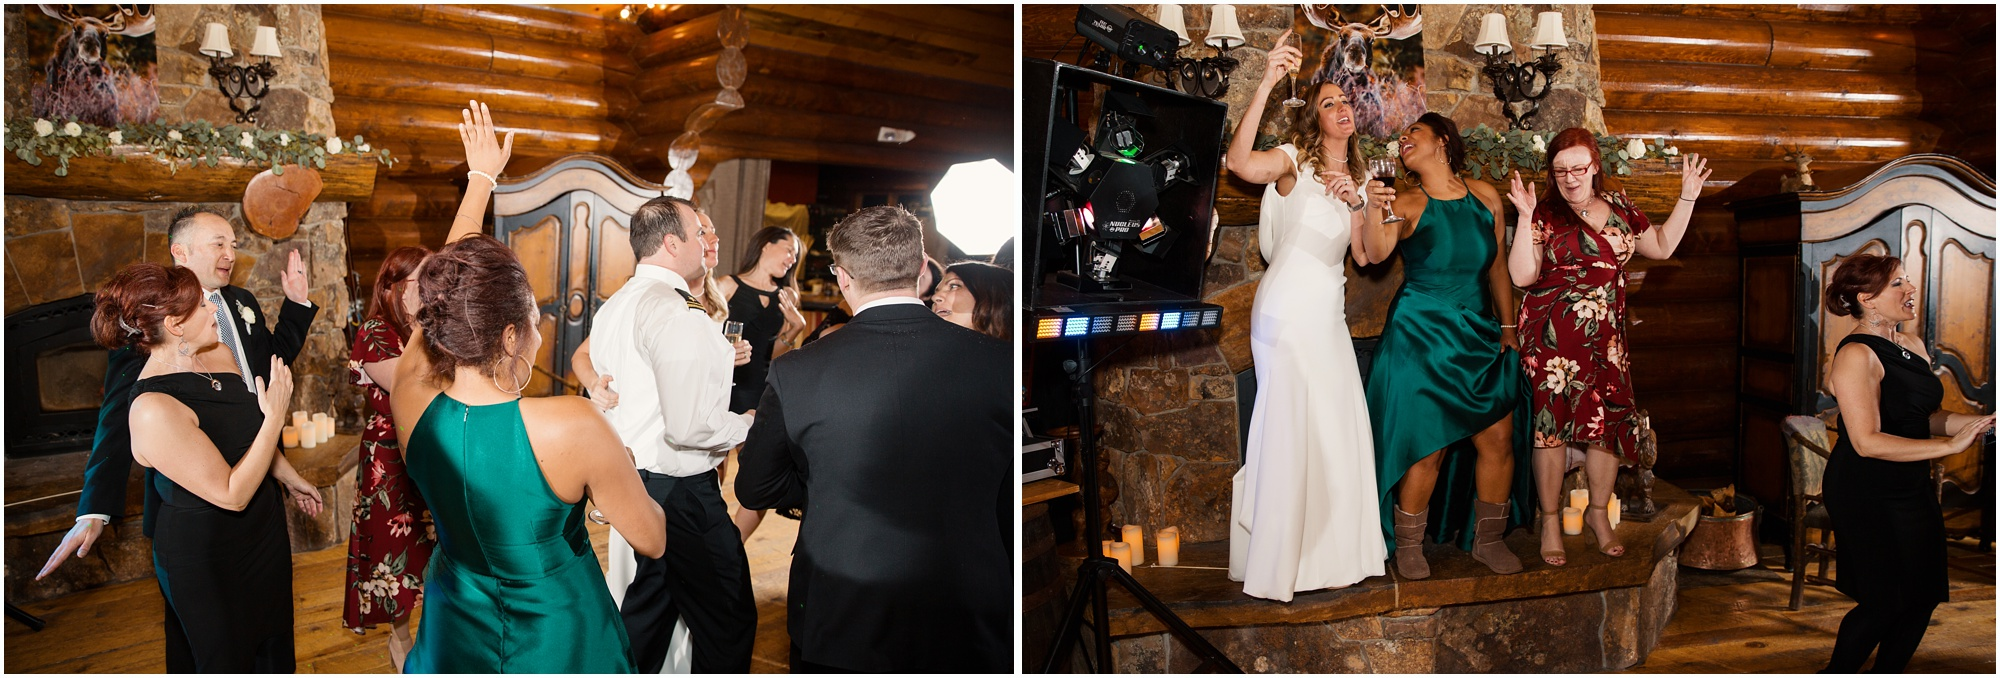 Breckenridge-Wedding-Photographer_0083.jpg